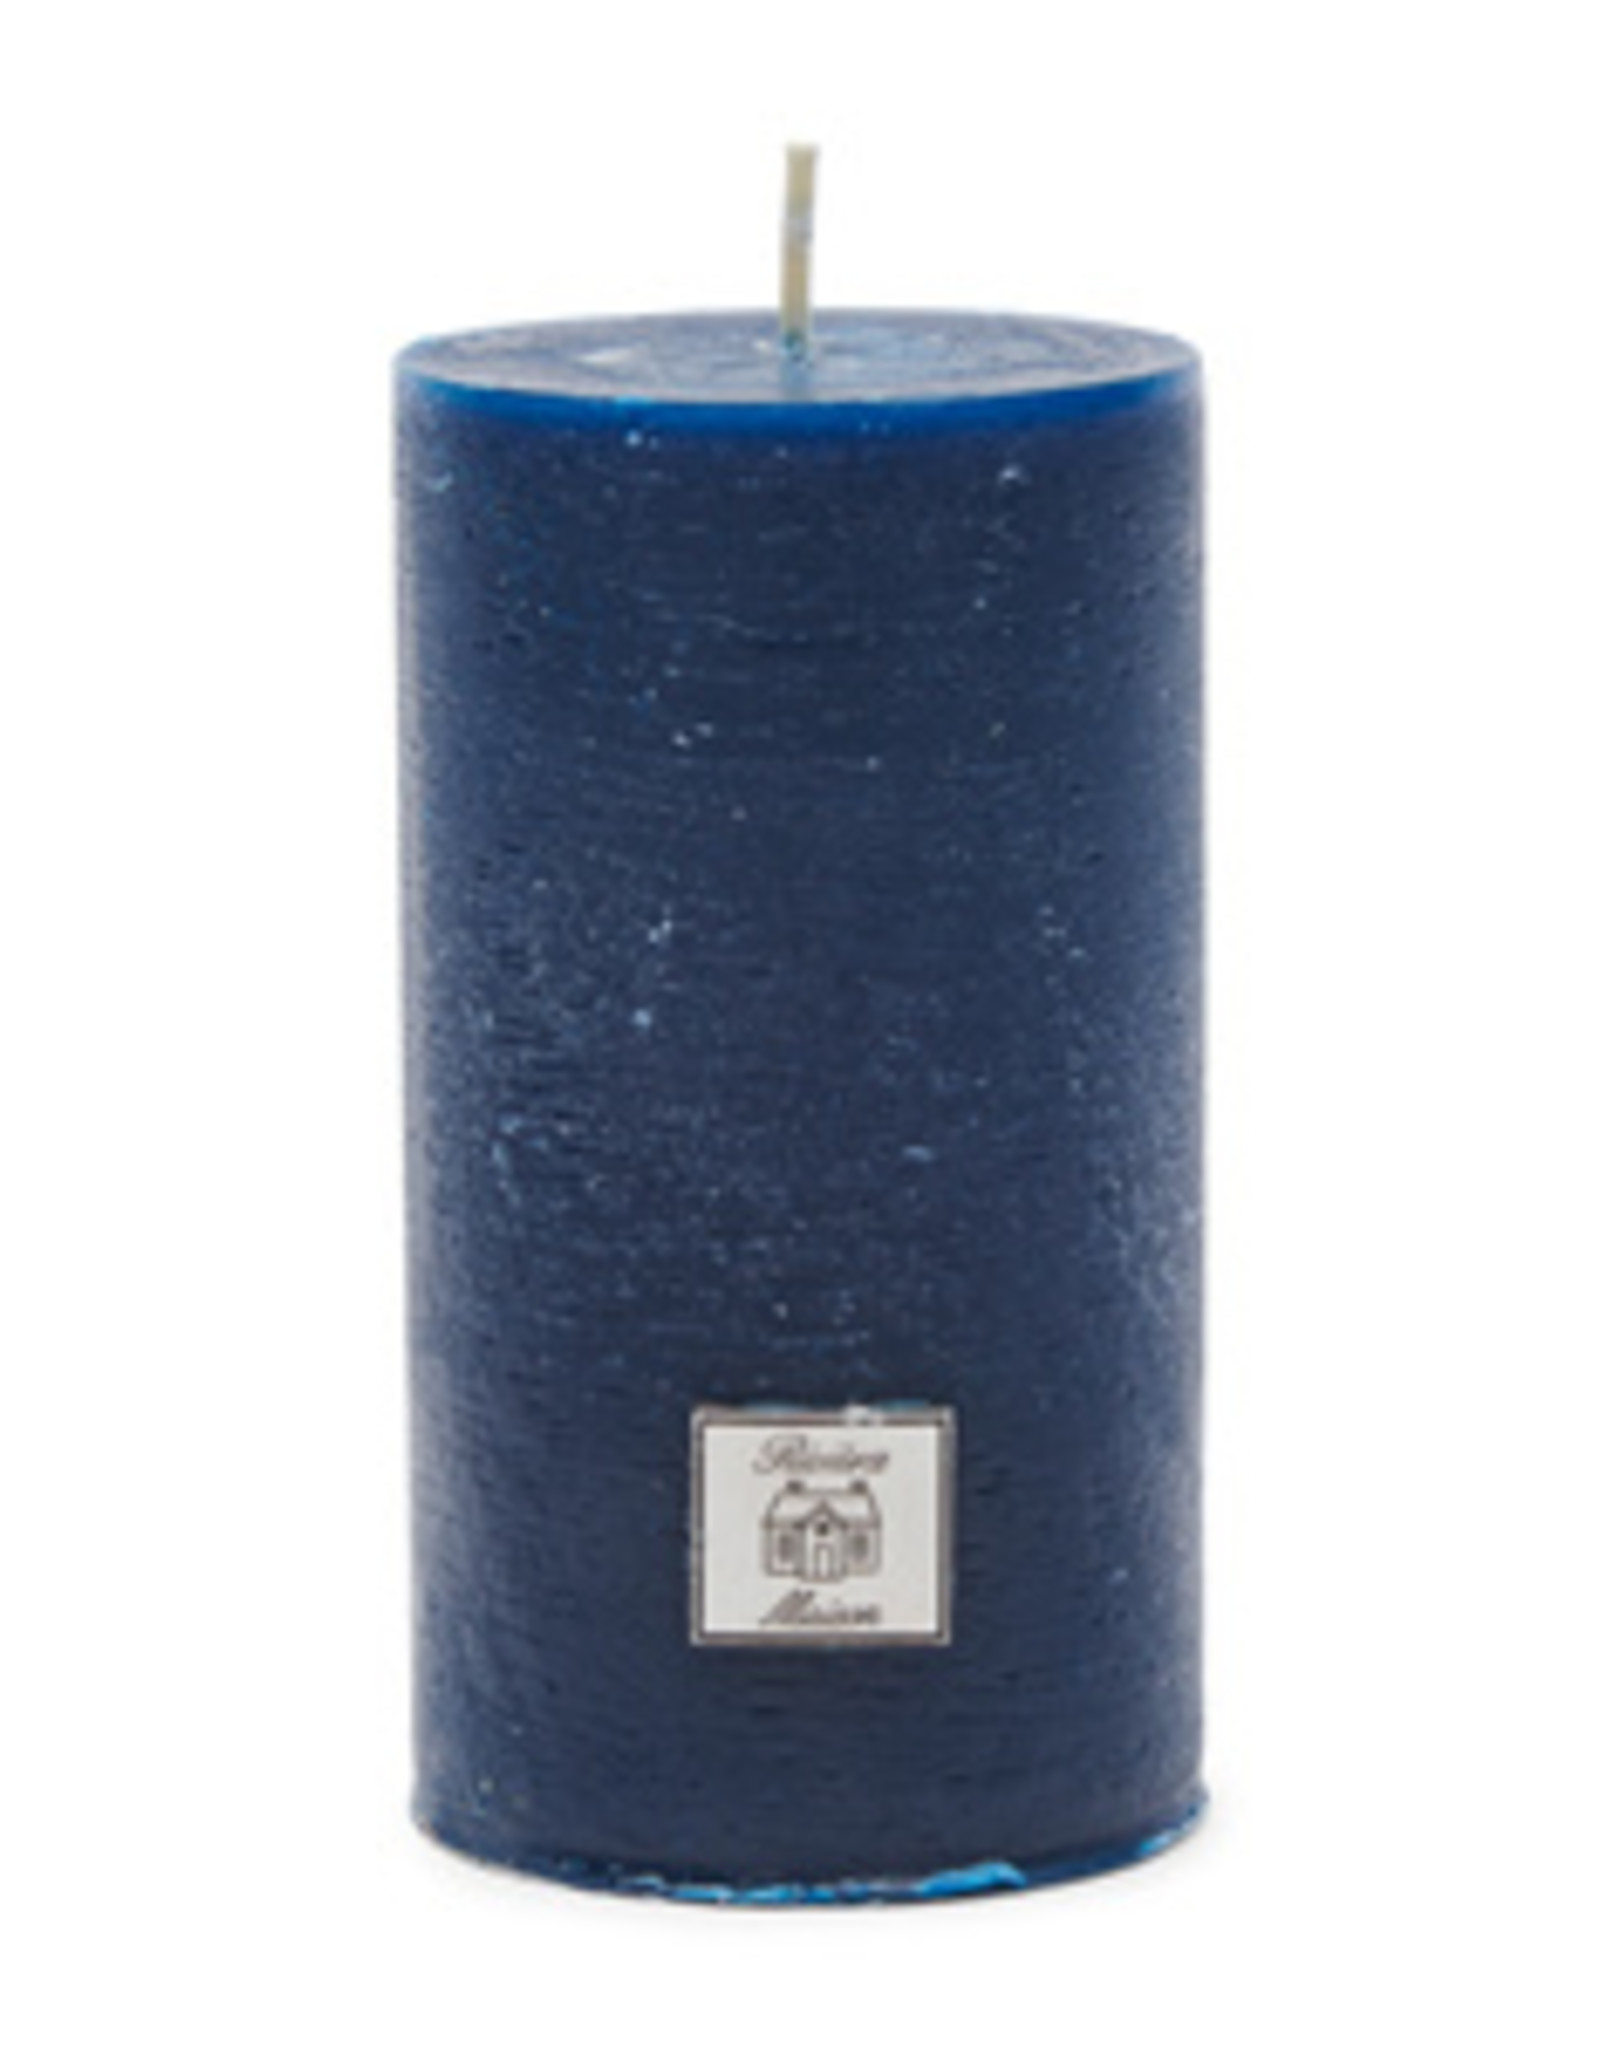 Riviera Maison Rustic Candle dress blue 7x13